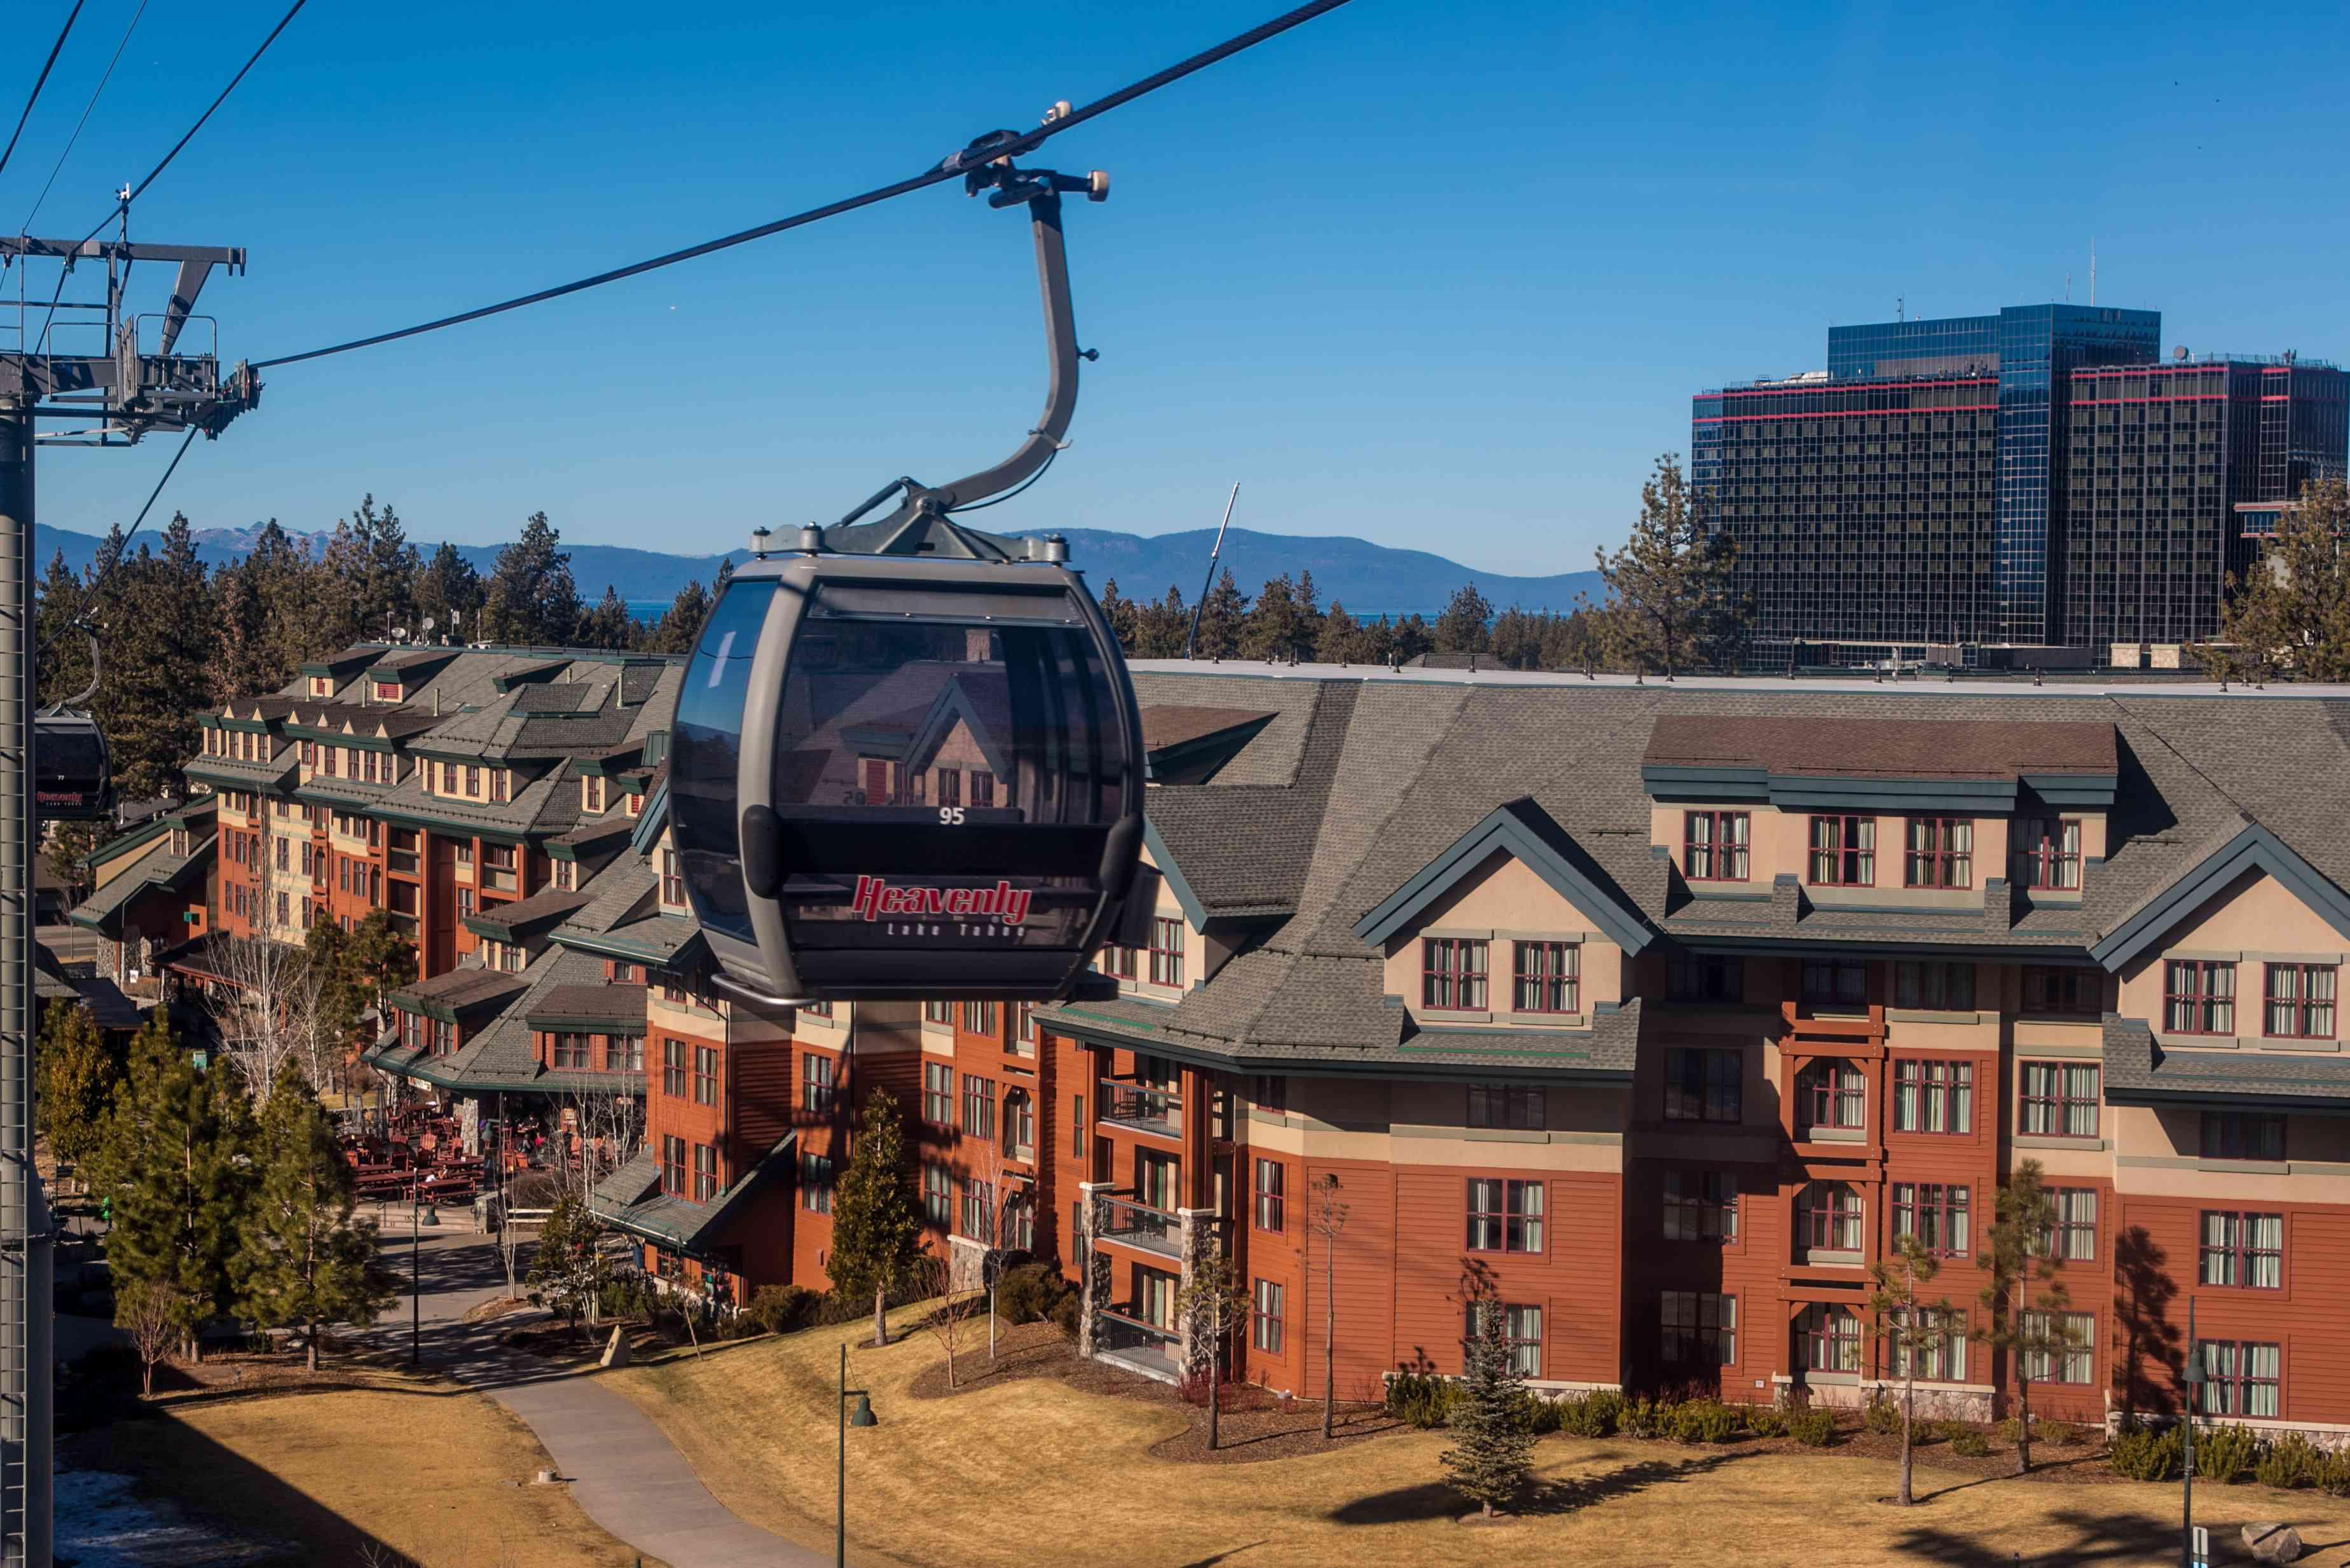 Aerial gondola at Heavenl, Lake Tahoe